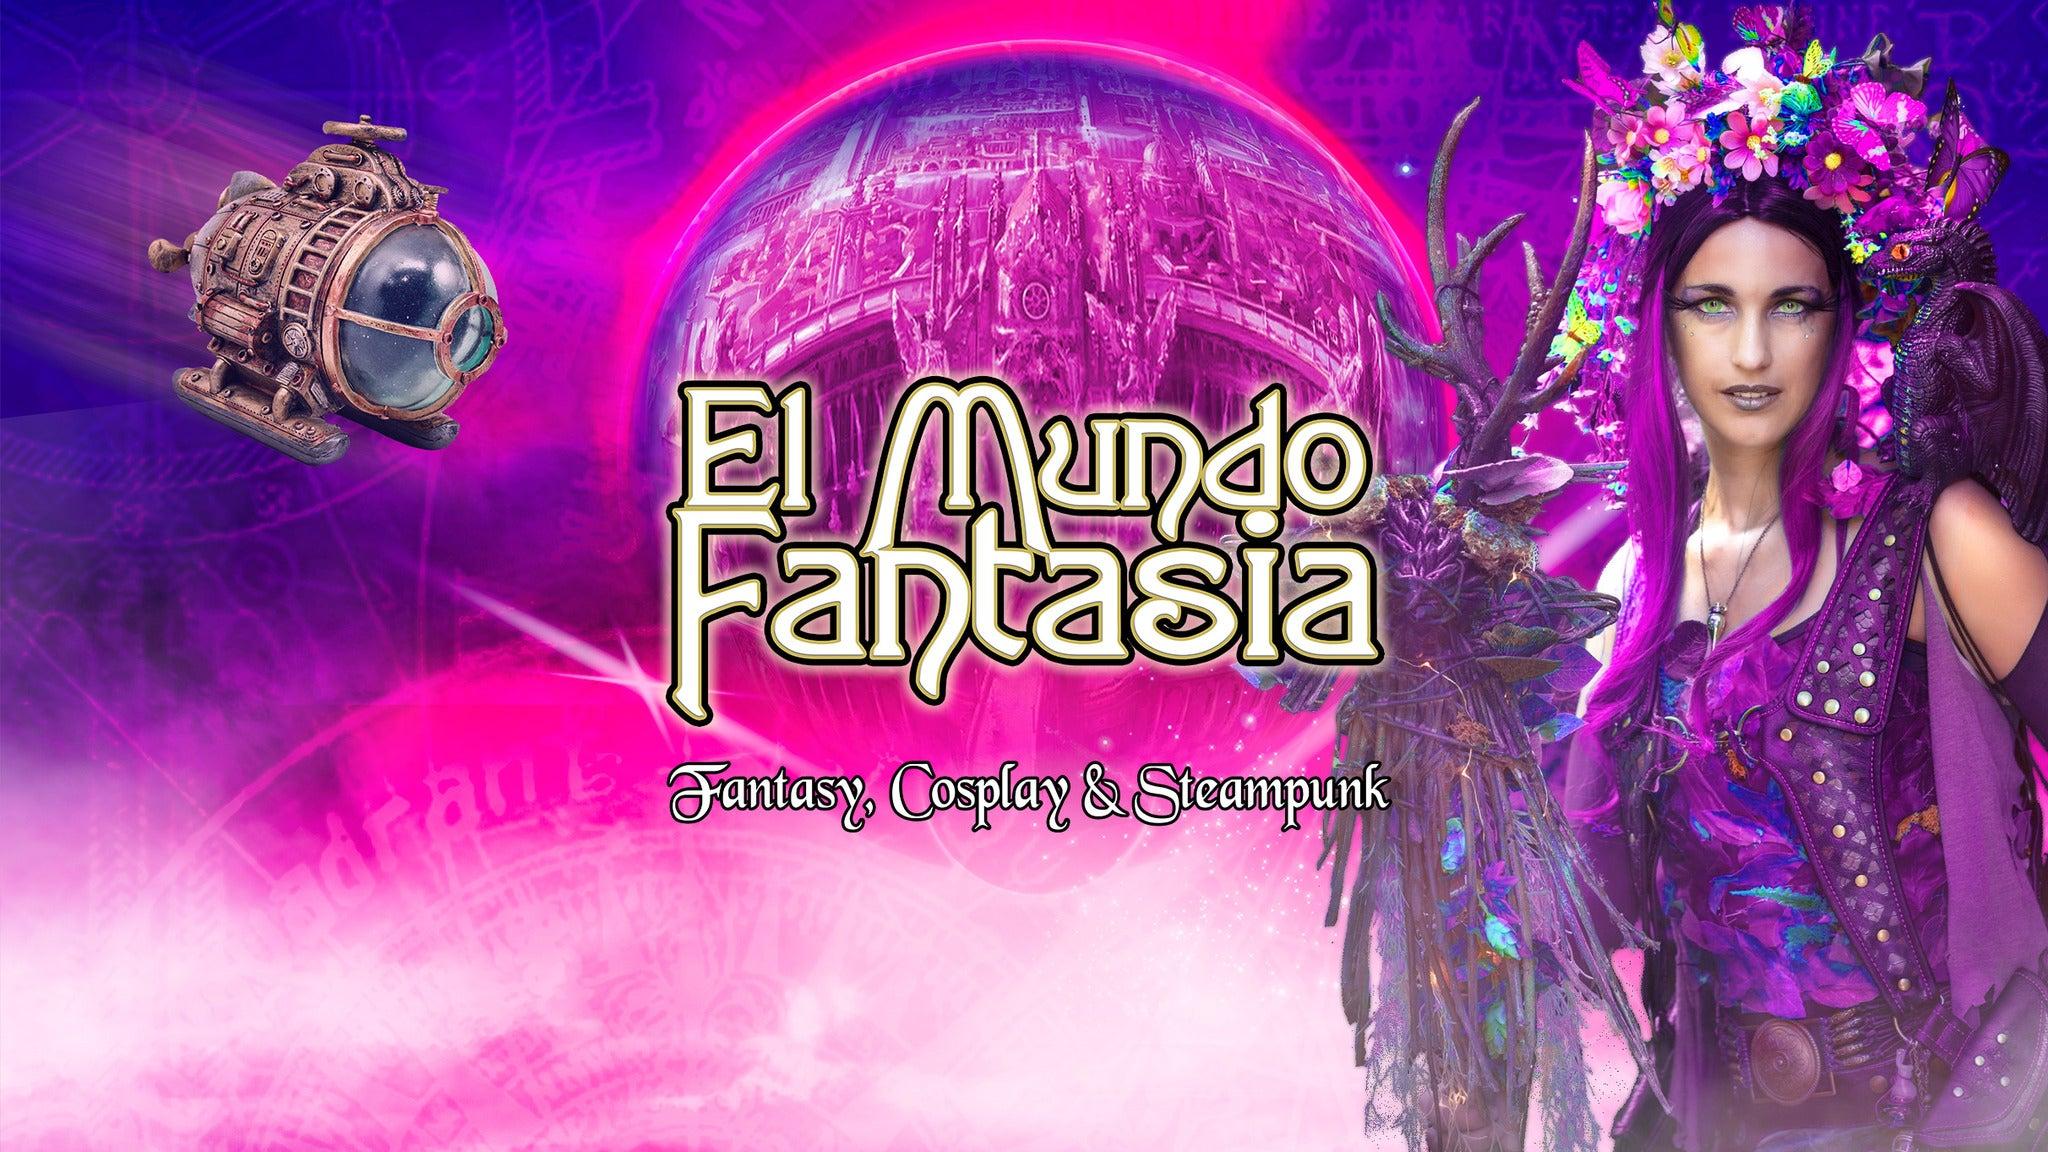 El Mundo Fantasia - 5th edition - (Timeslot 10.00 - 11.00)